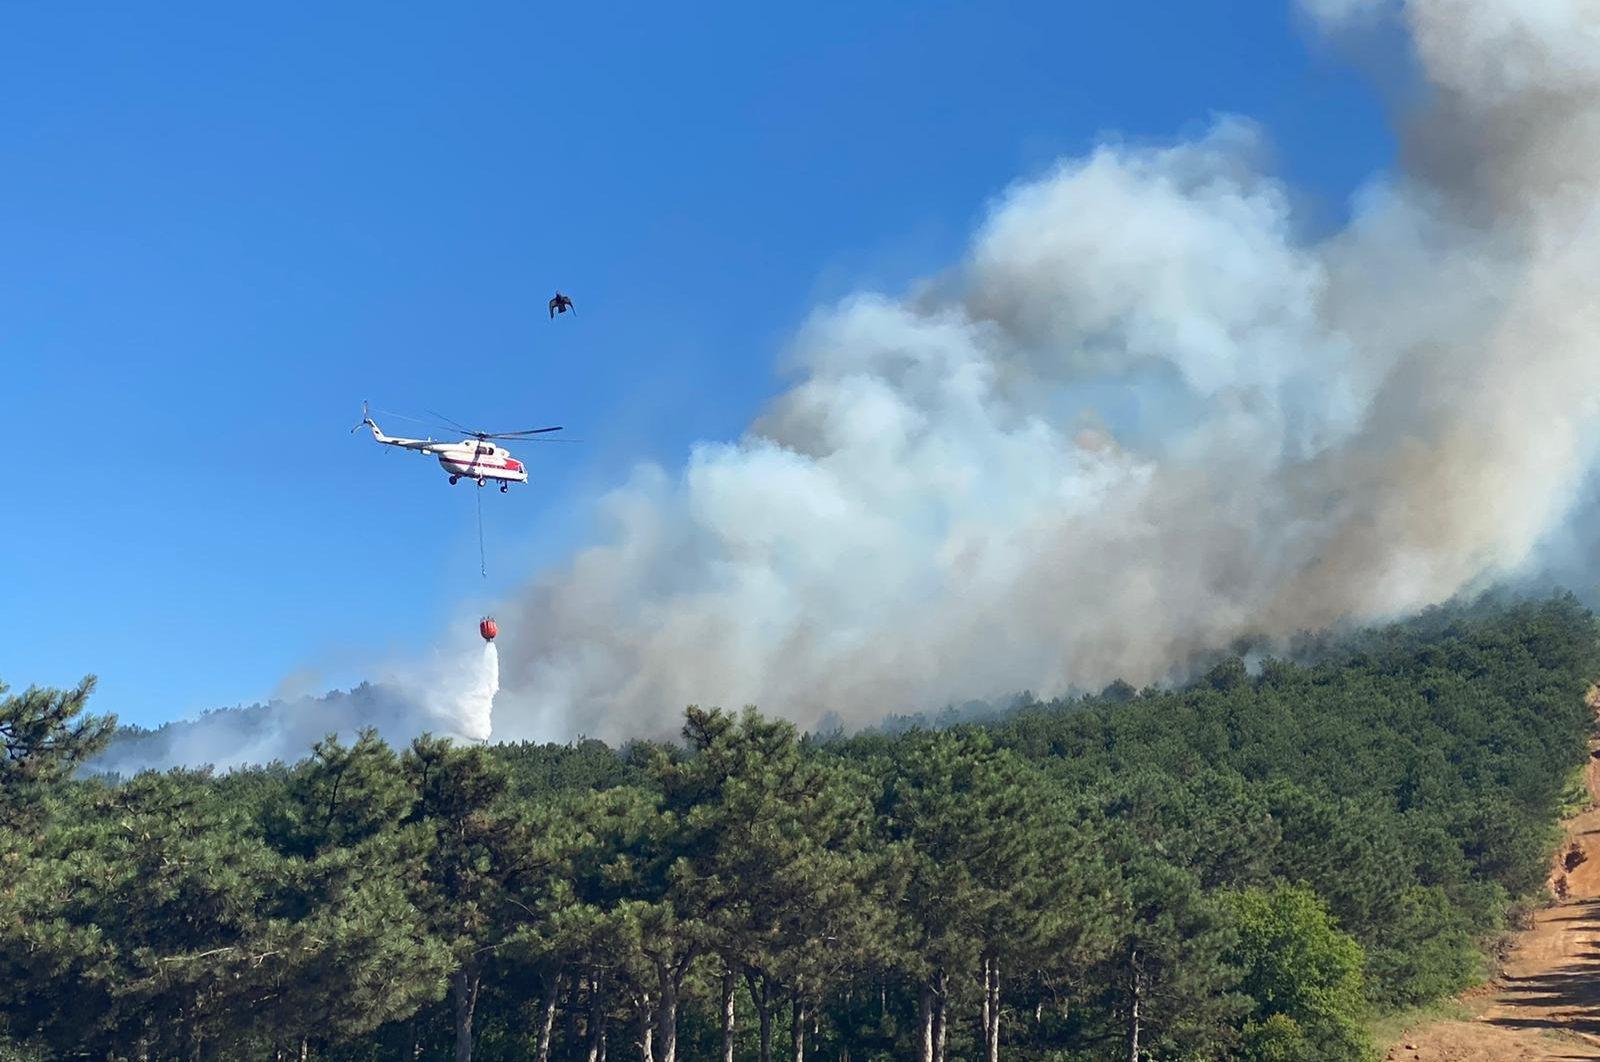 A forest fire broke out near Kayışdağı neighborhood in Istanbul's district of Maltepe, on June 28, 2020. (DHA Photo)